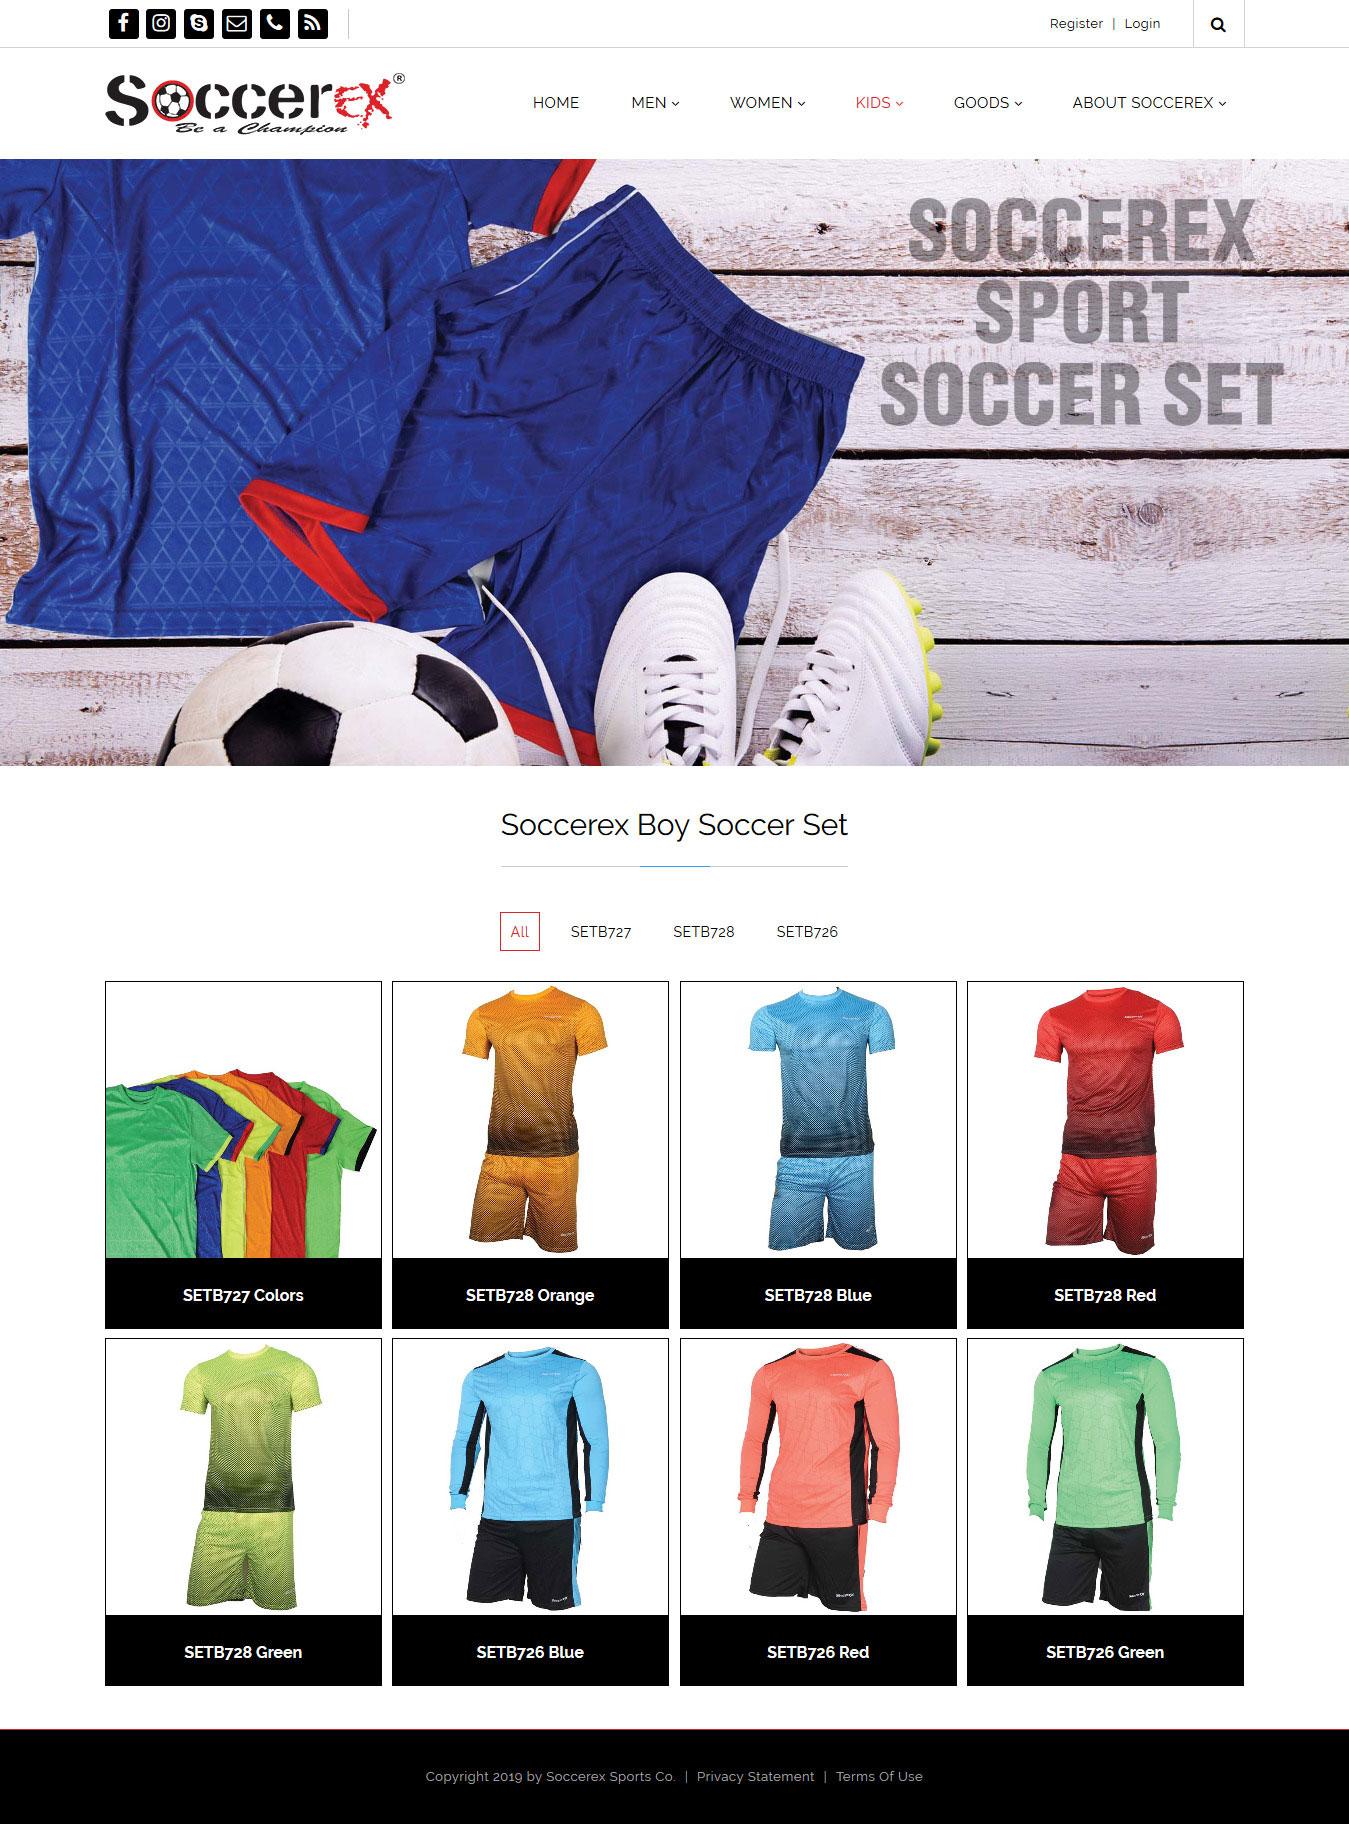 soccerexsport-03